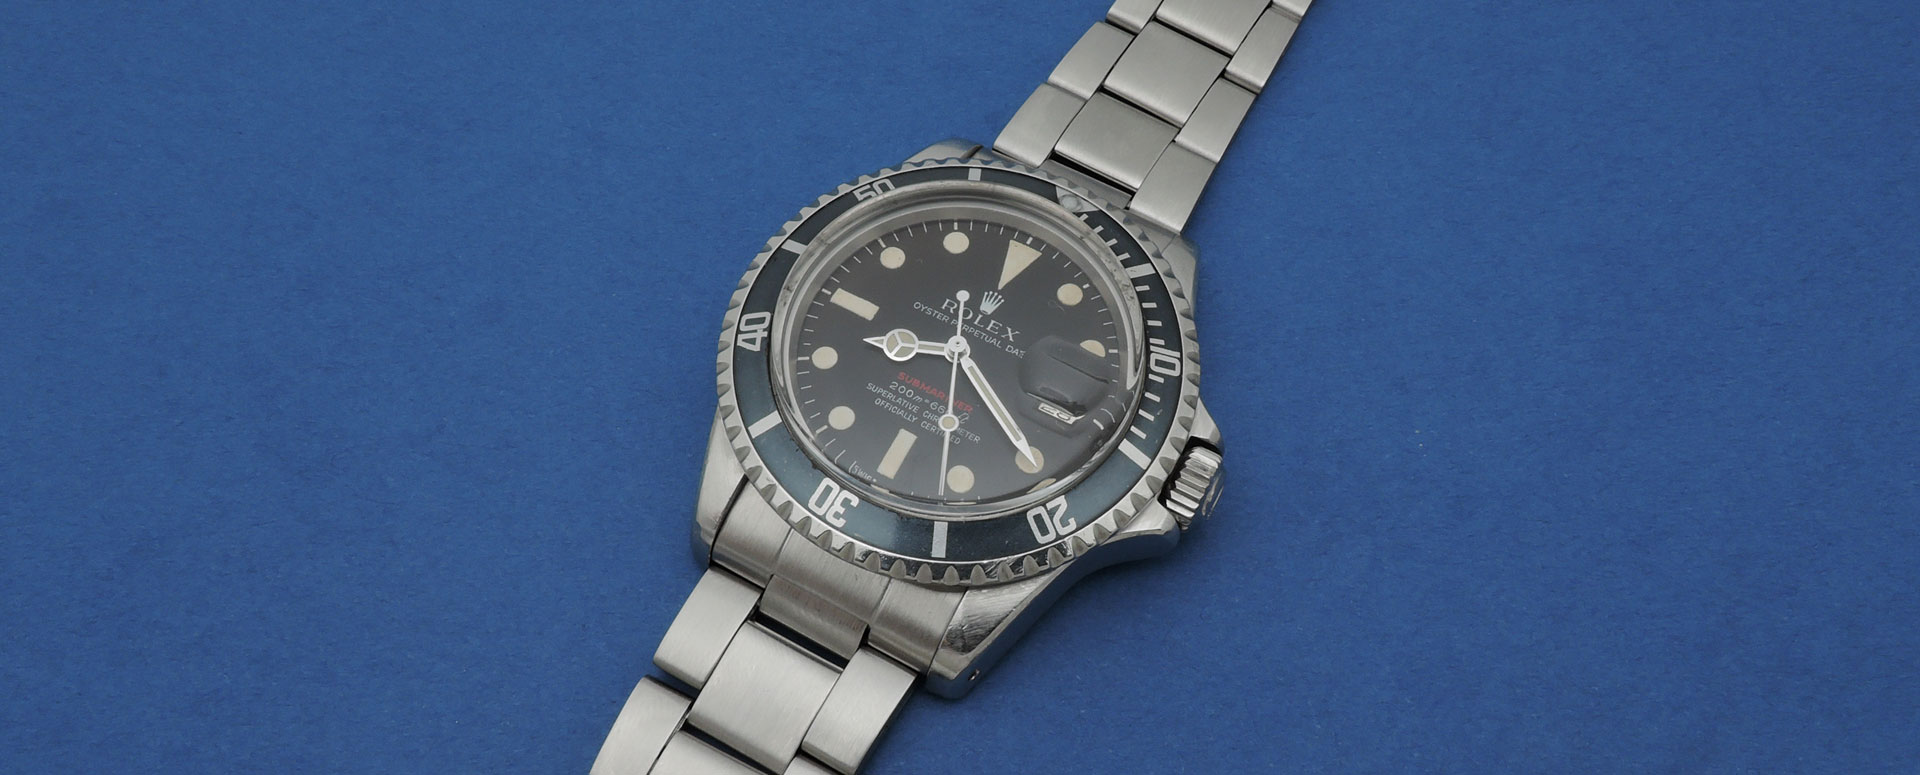 b564bd058c00 Ancienne  Compra Venta de Relojes · Calatrava 3445  Daytona 16520   Submariner 1680 ...